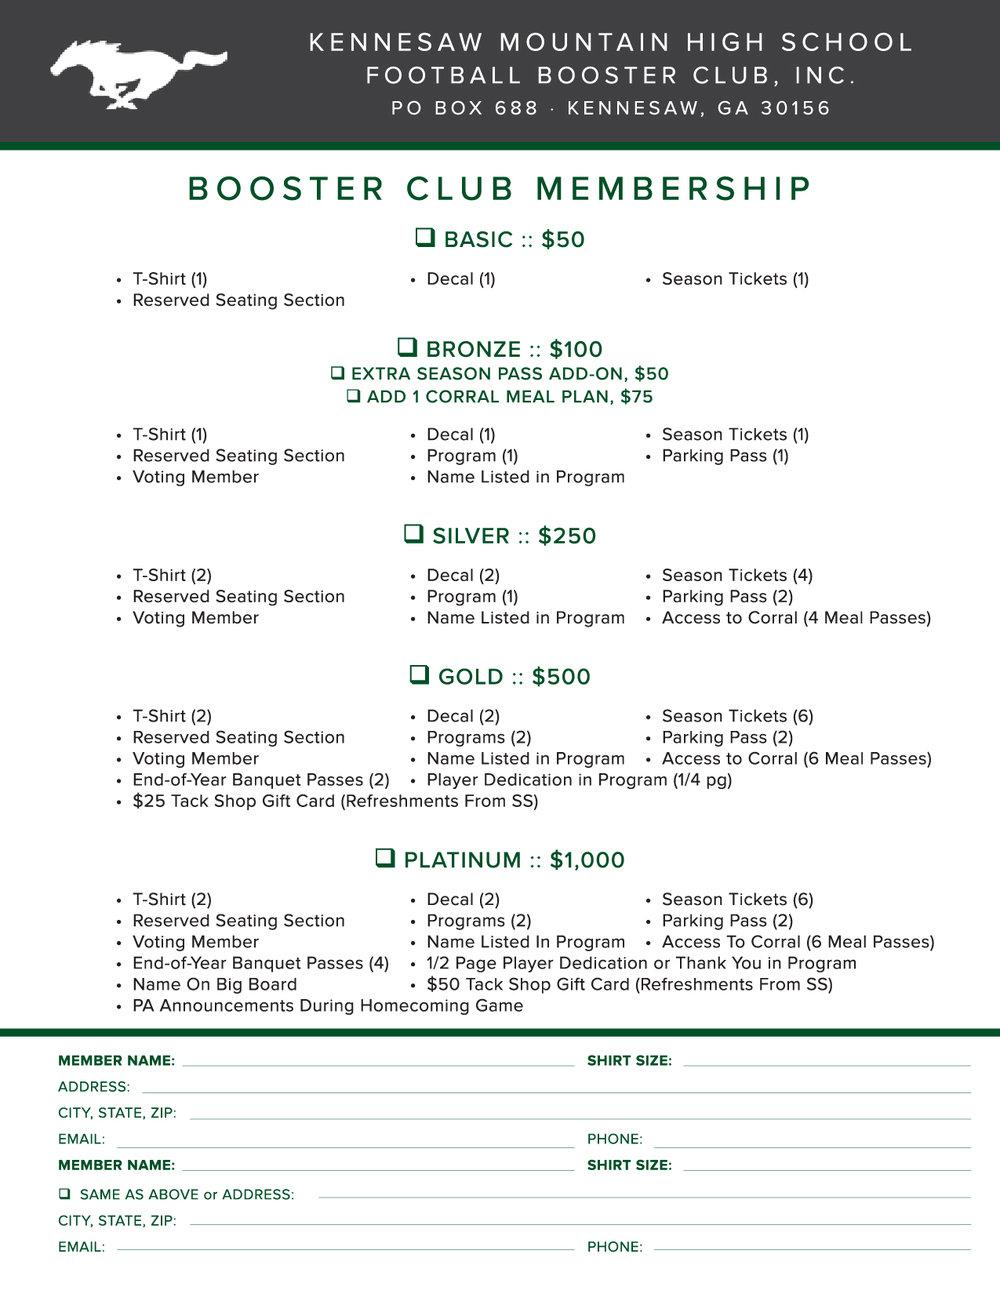 BOOSTER CLUB MEMBERSHIP-01.jpg